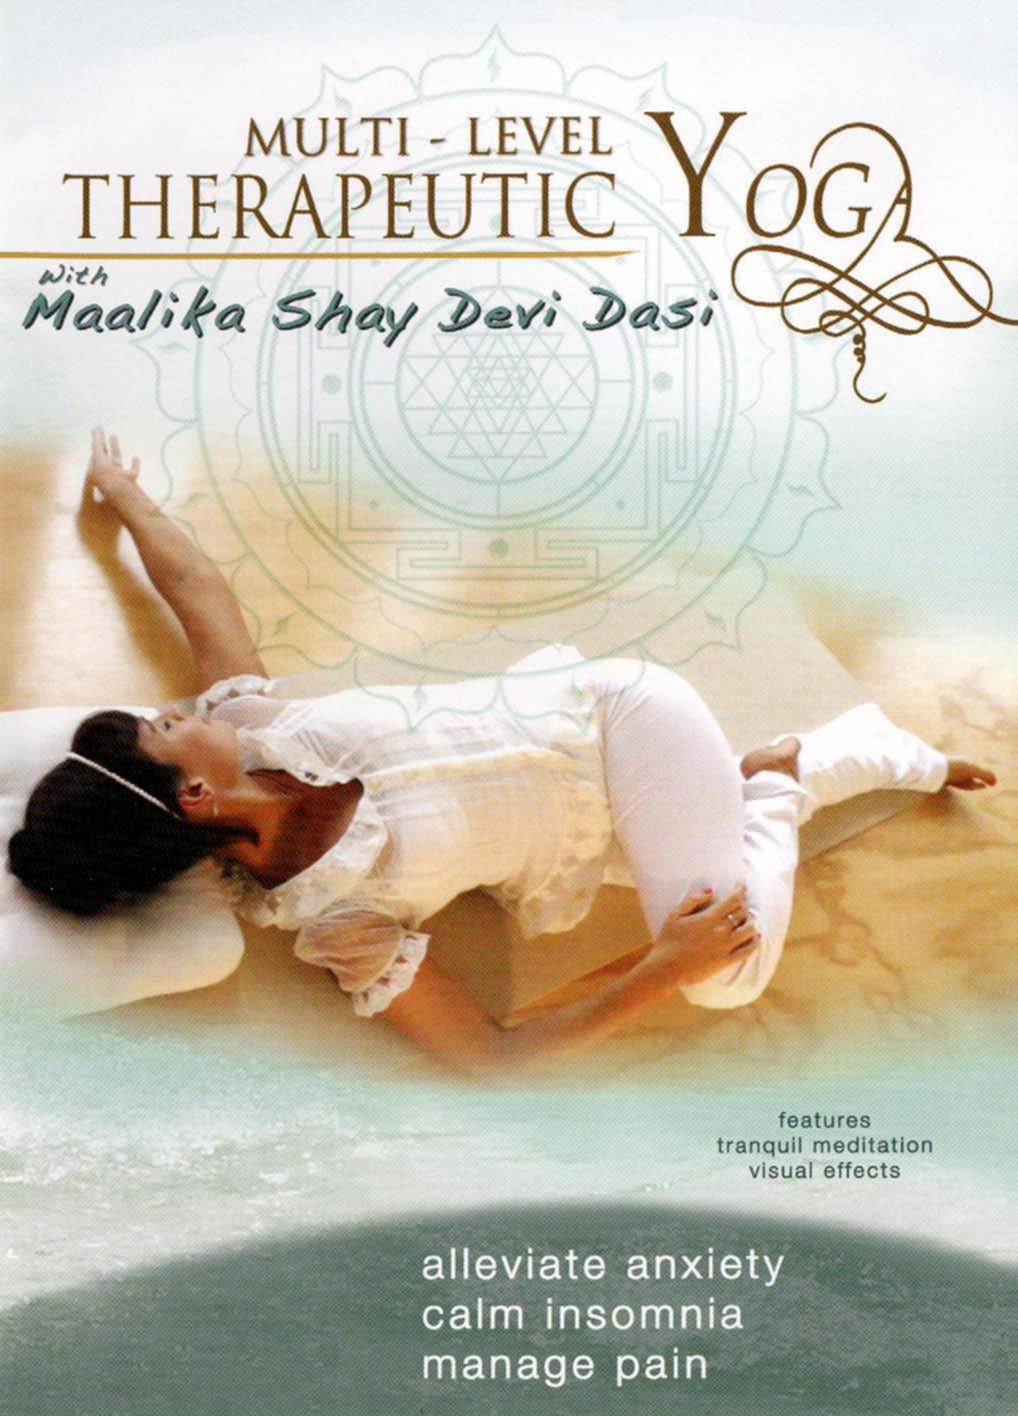 Maalika Shay Devi Dasi: Multi-Level Therapeutic Yoga